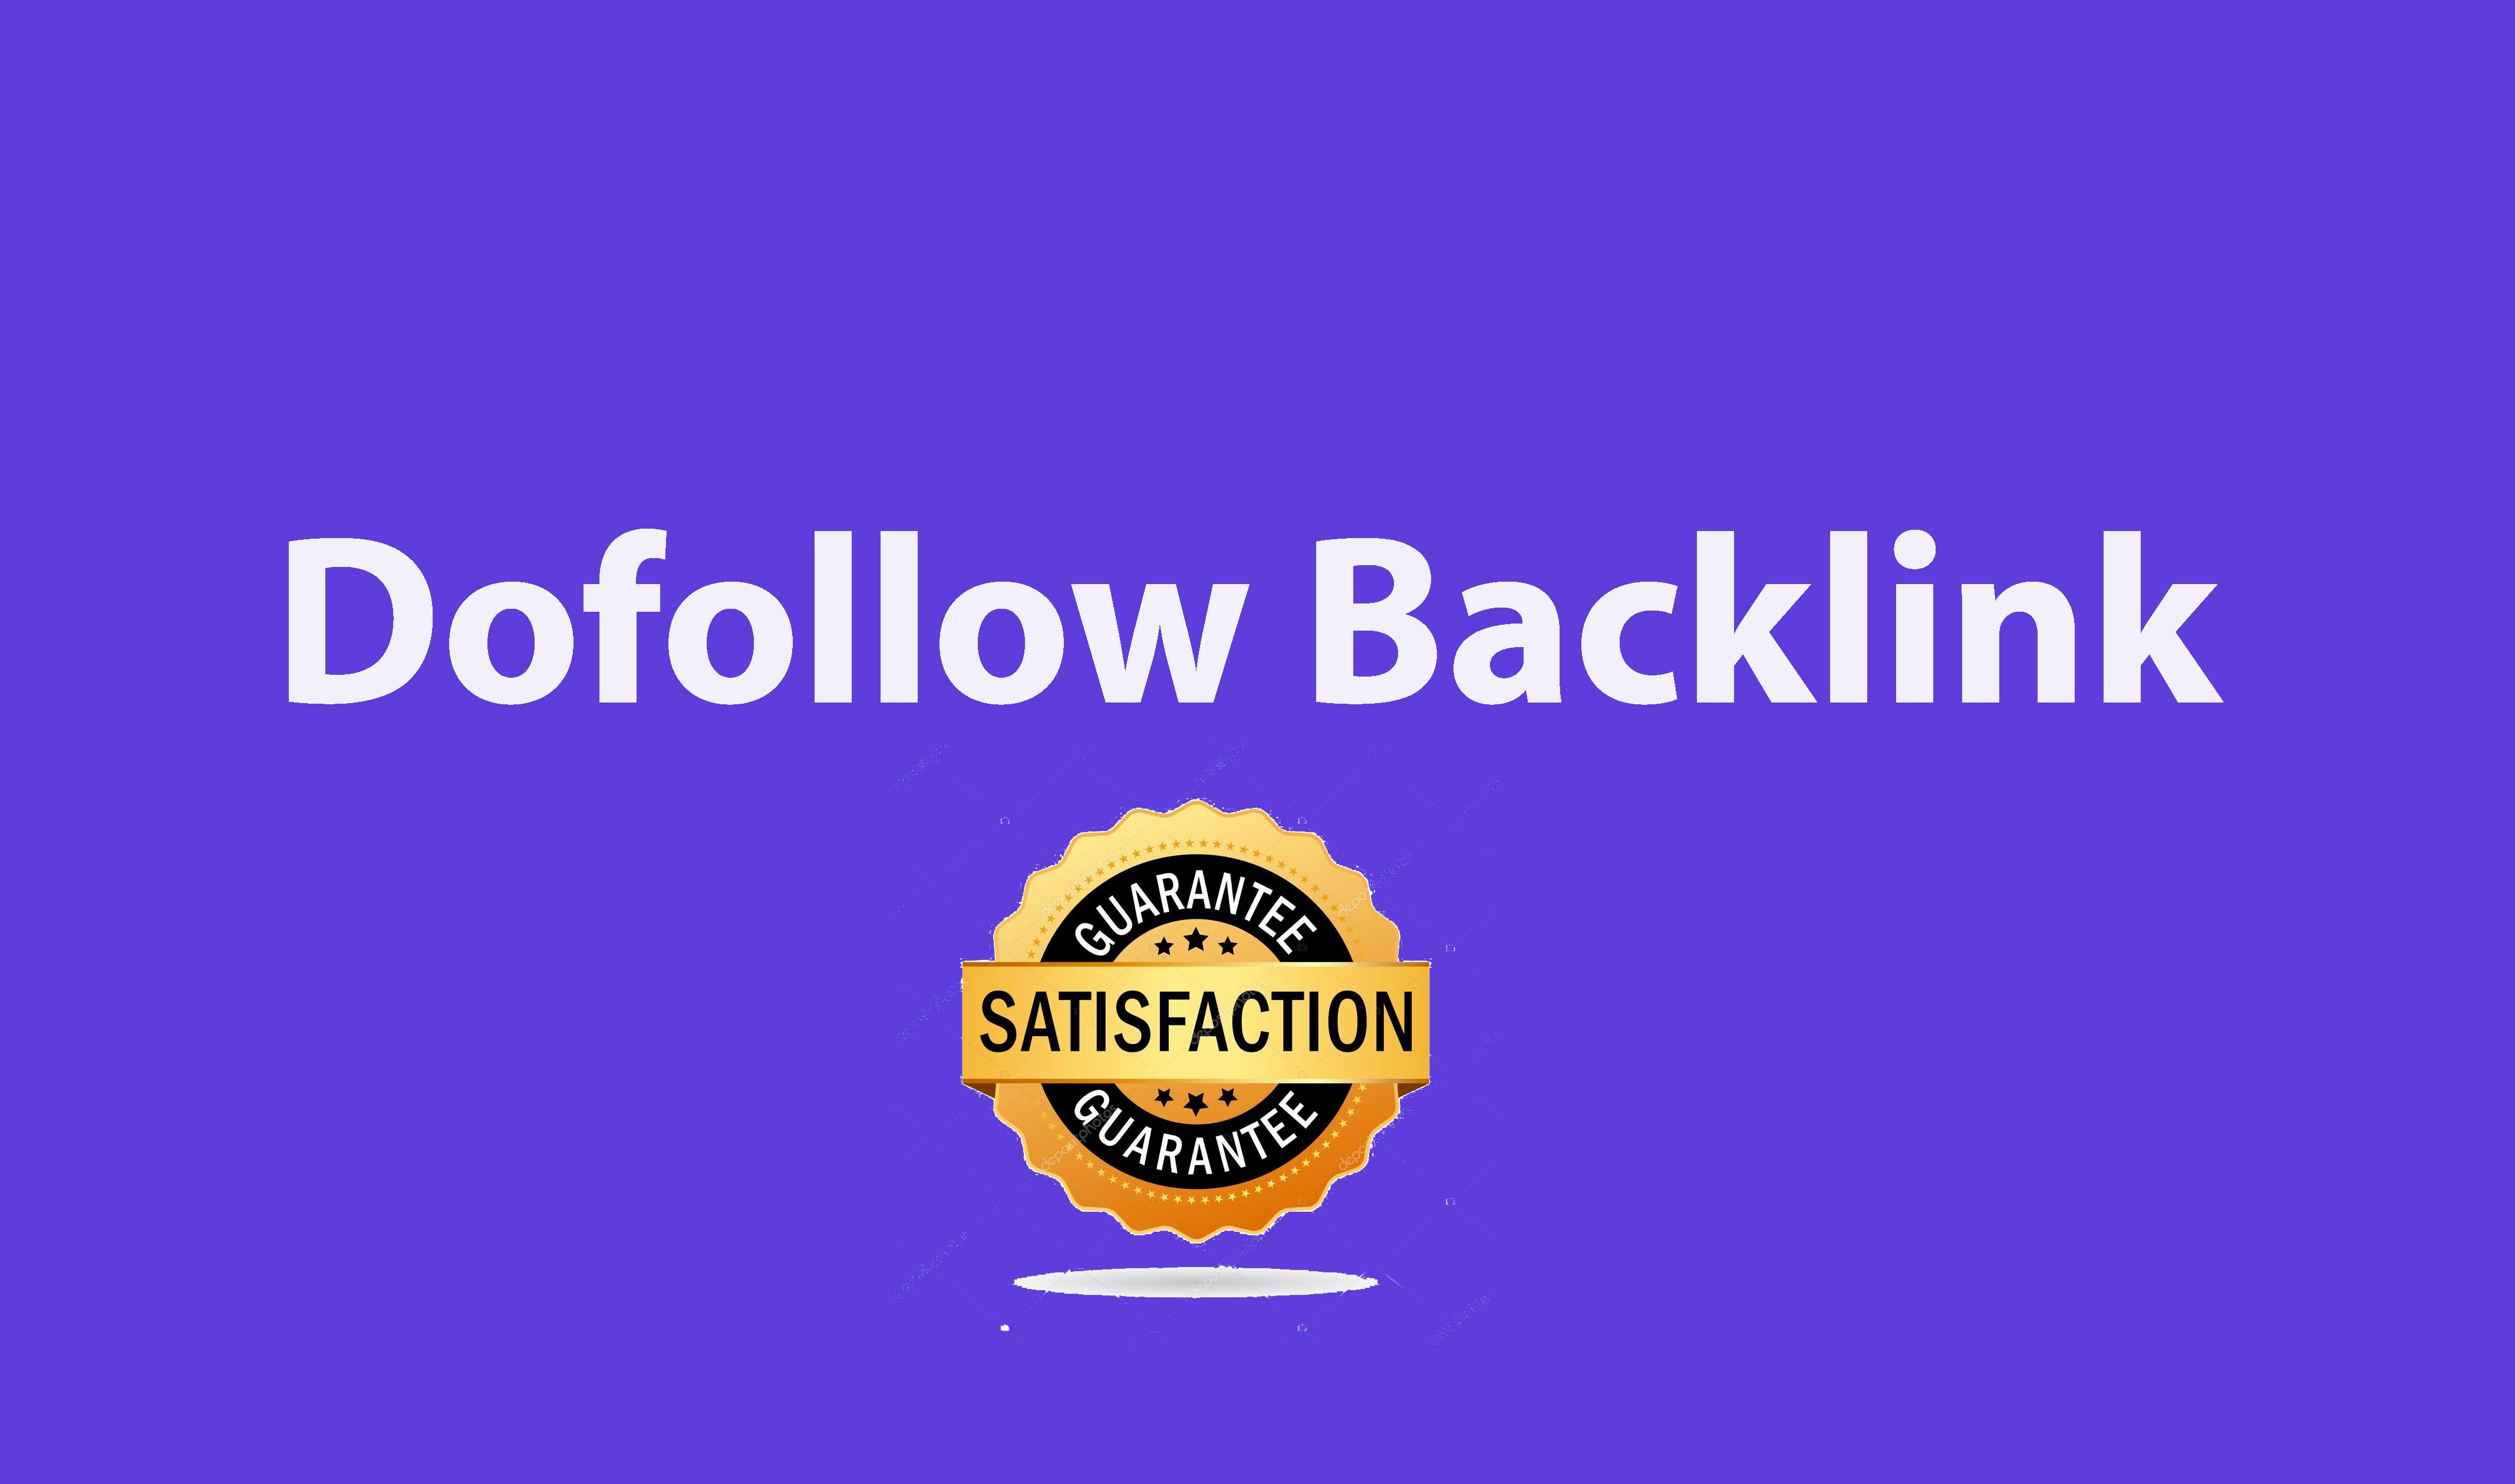 50 Do-follow backlinks mix platforms - Full Details